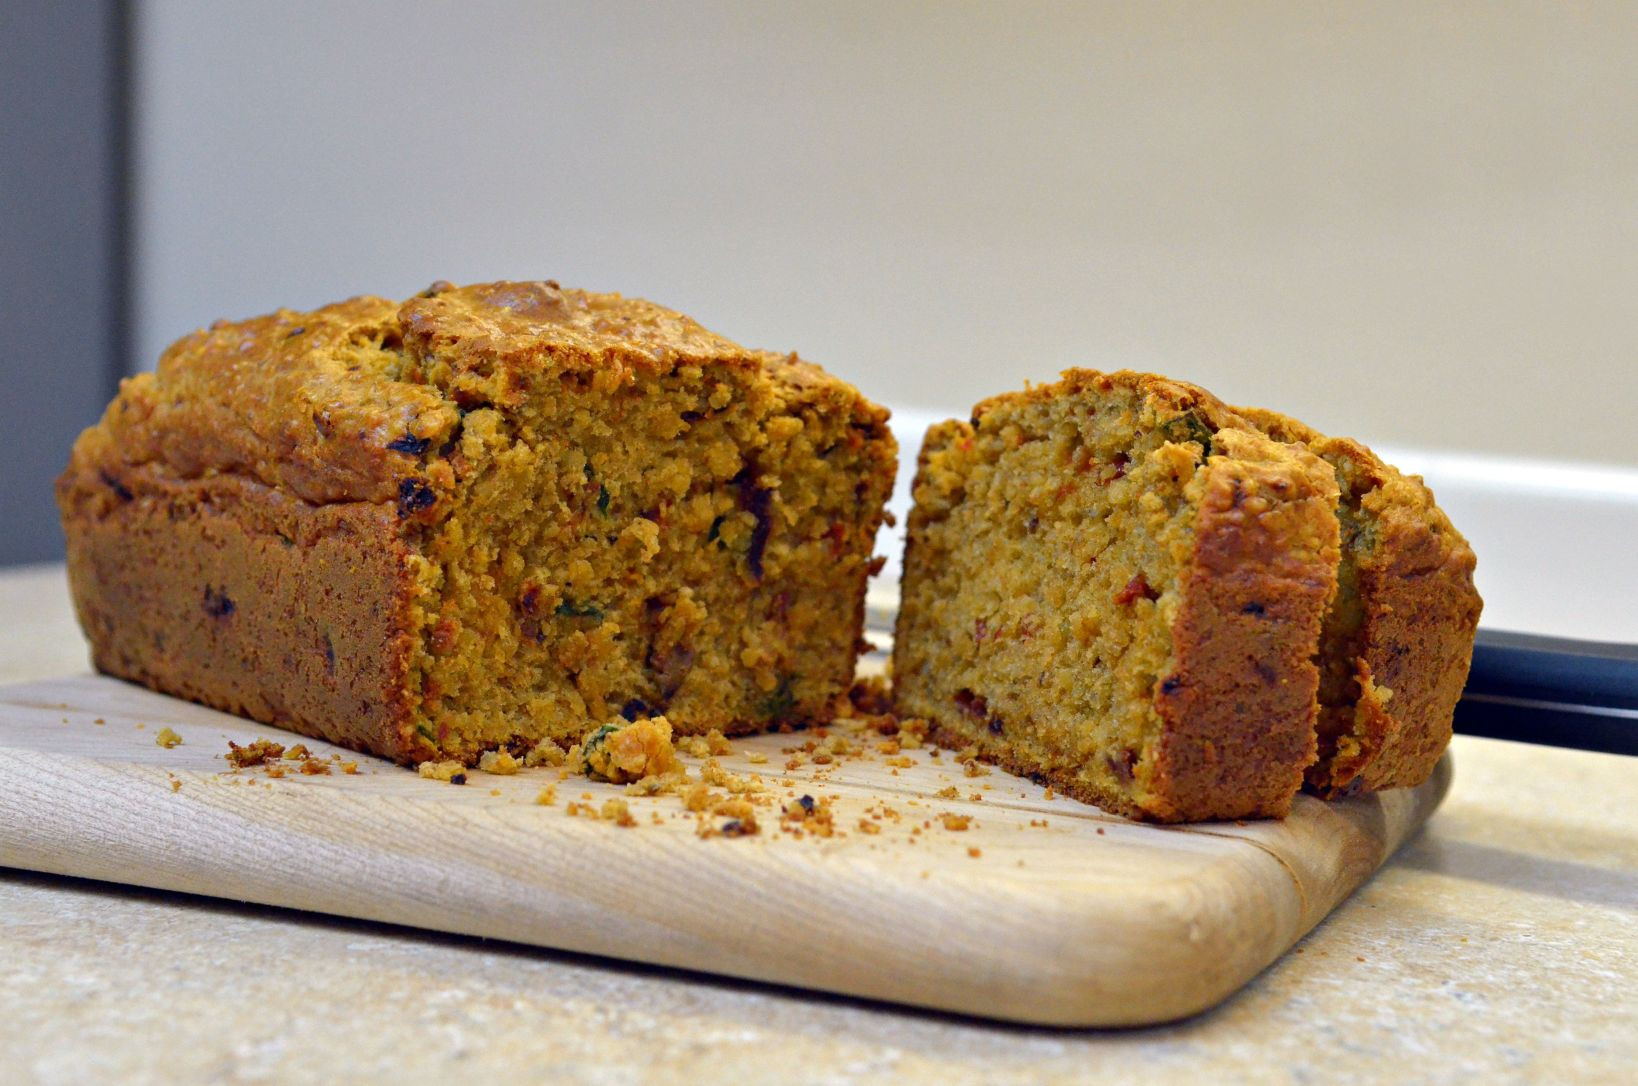 Meatless Mondays: Savory Oat Bread - Bob's Red Mill Blog